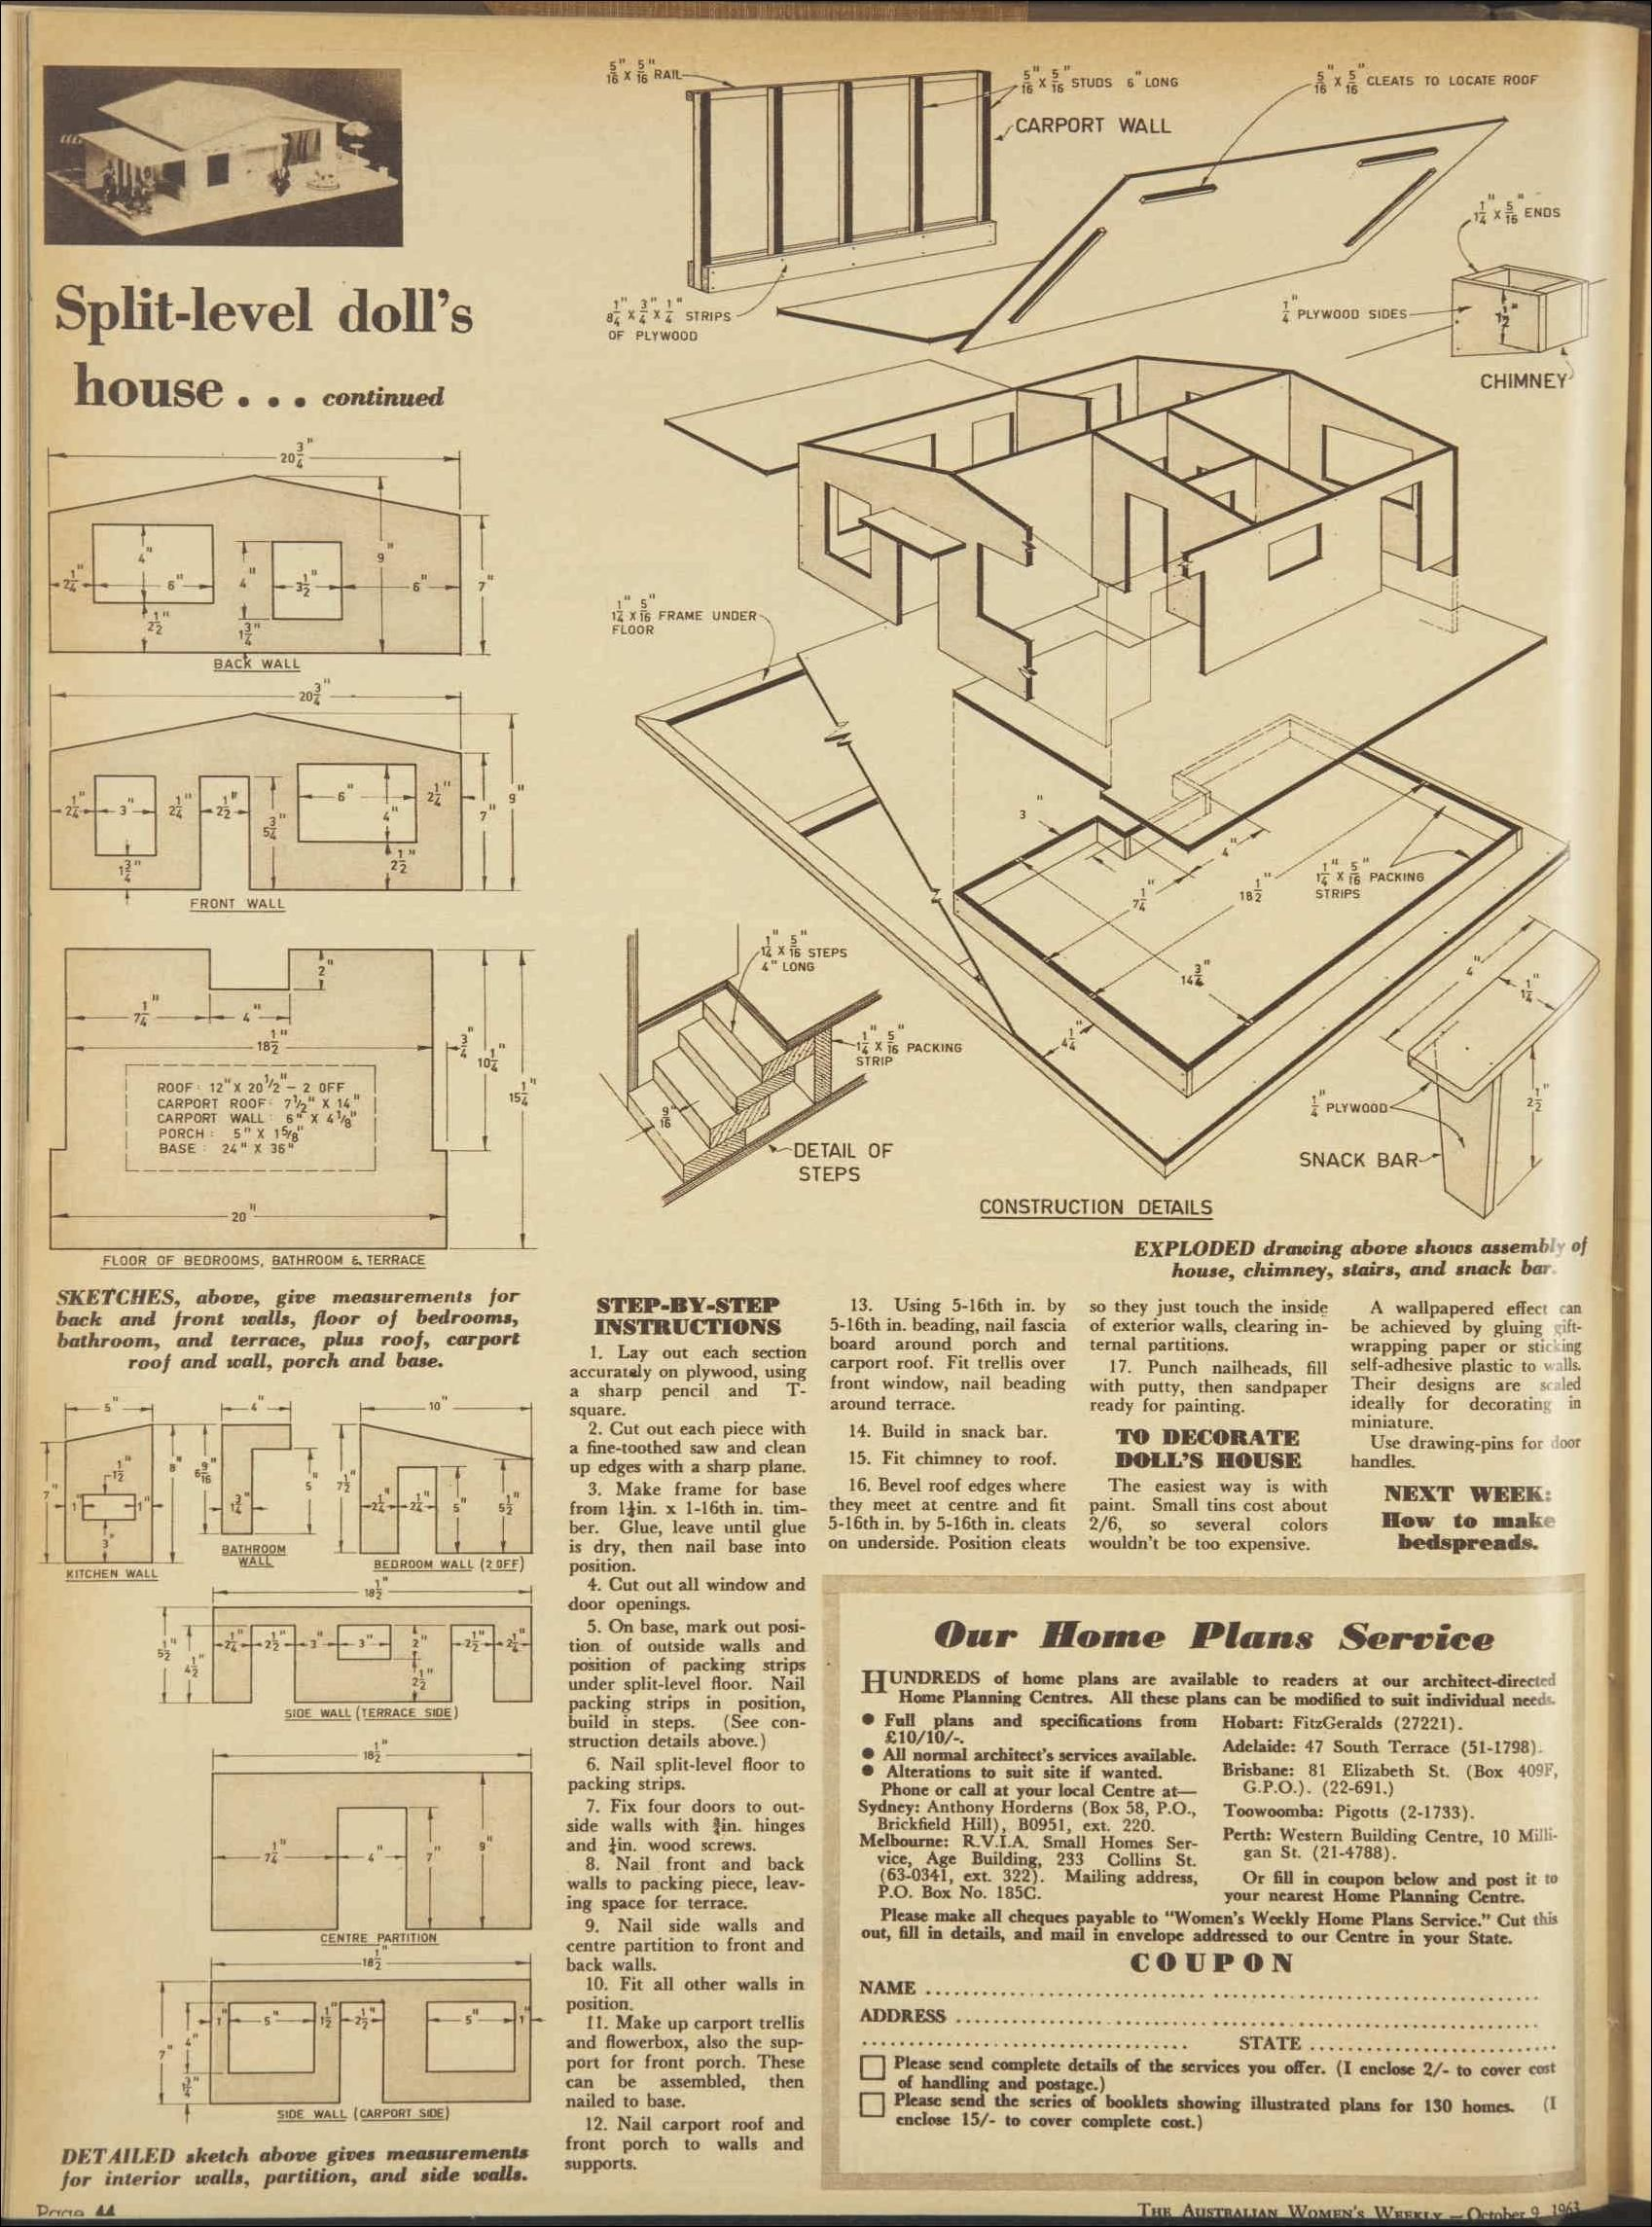 dollhouse furniture plans. Plans For A Split-level 1960s Doll\u0027s House 9 Oct 1963 - The Australian Women\u0027s Dollhouse Furniture